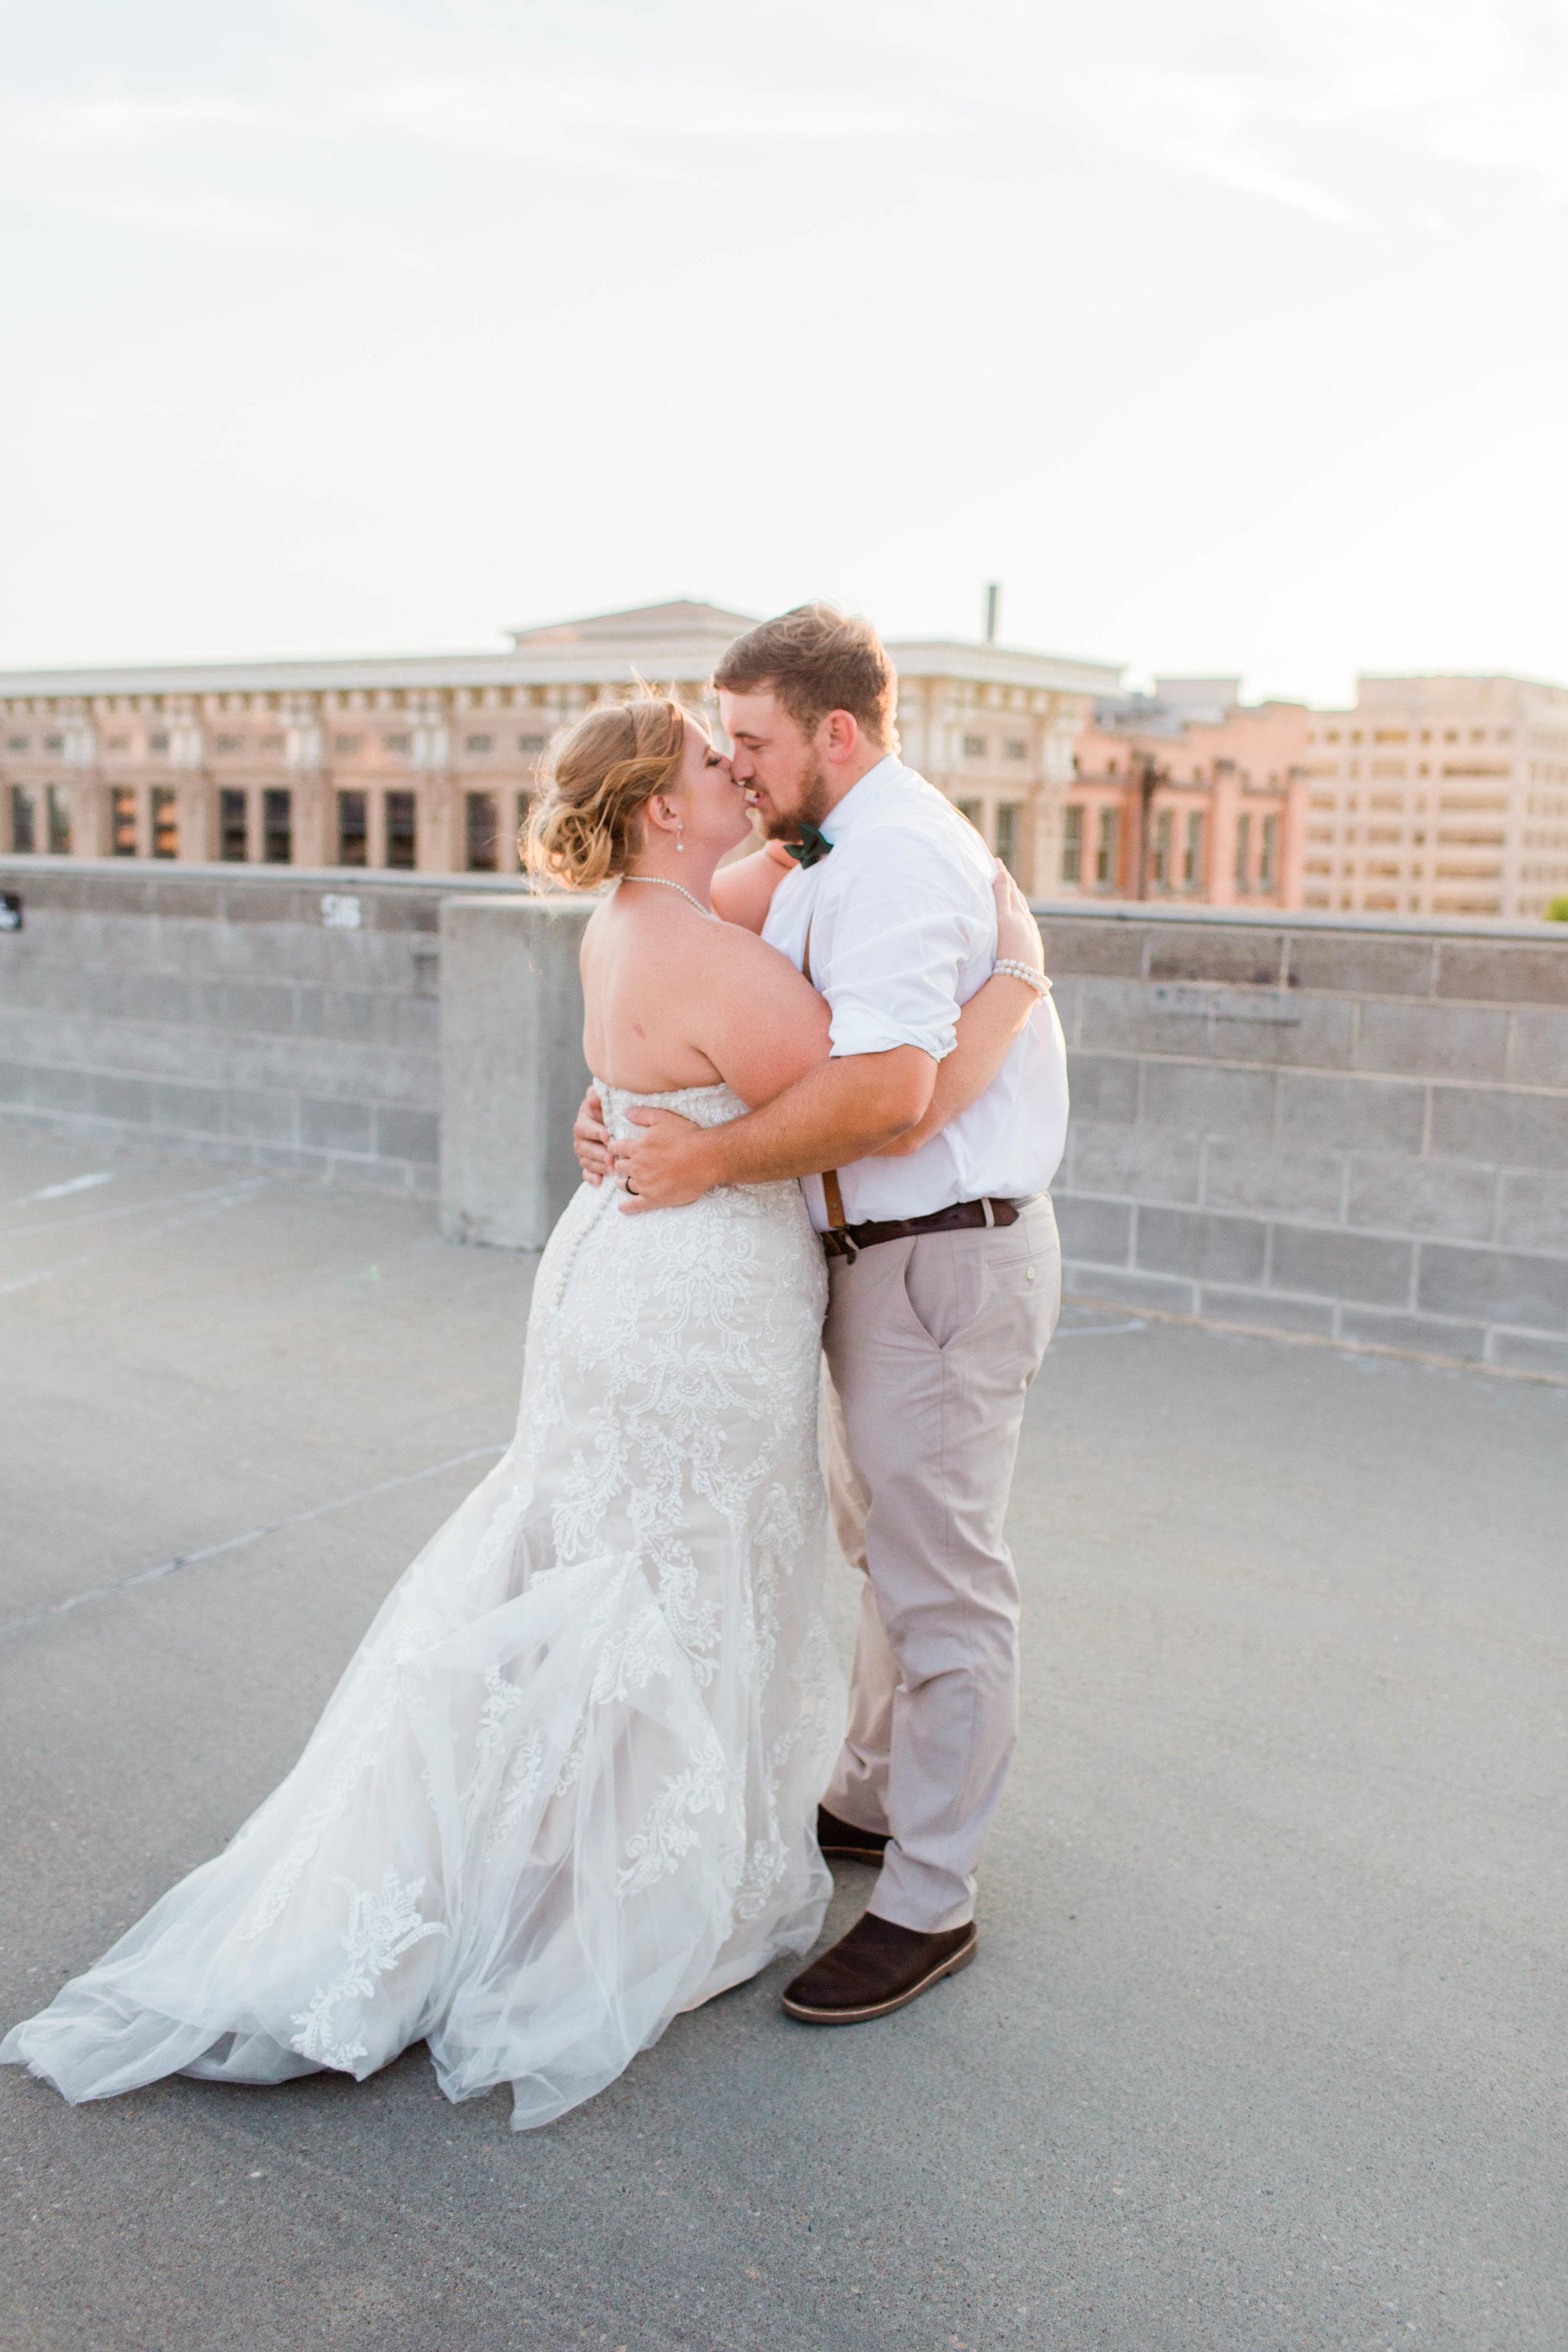 E-Lydia-Rohan-Downtown-Boise-Wedding-15.jpg